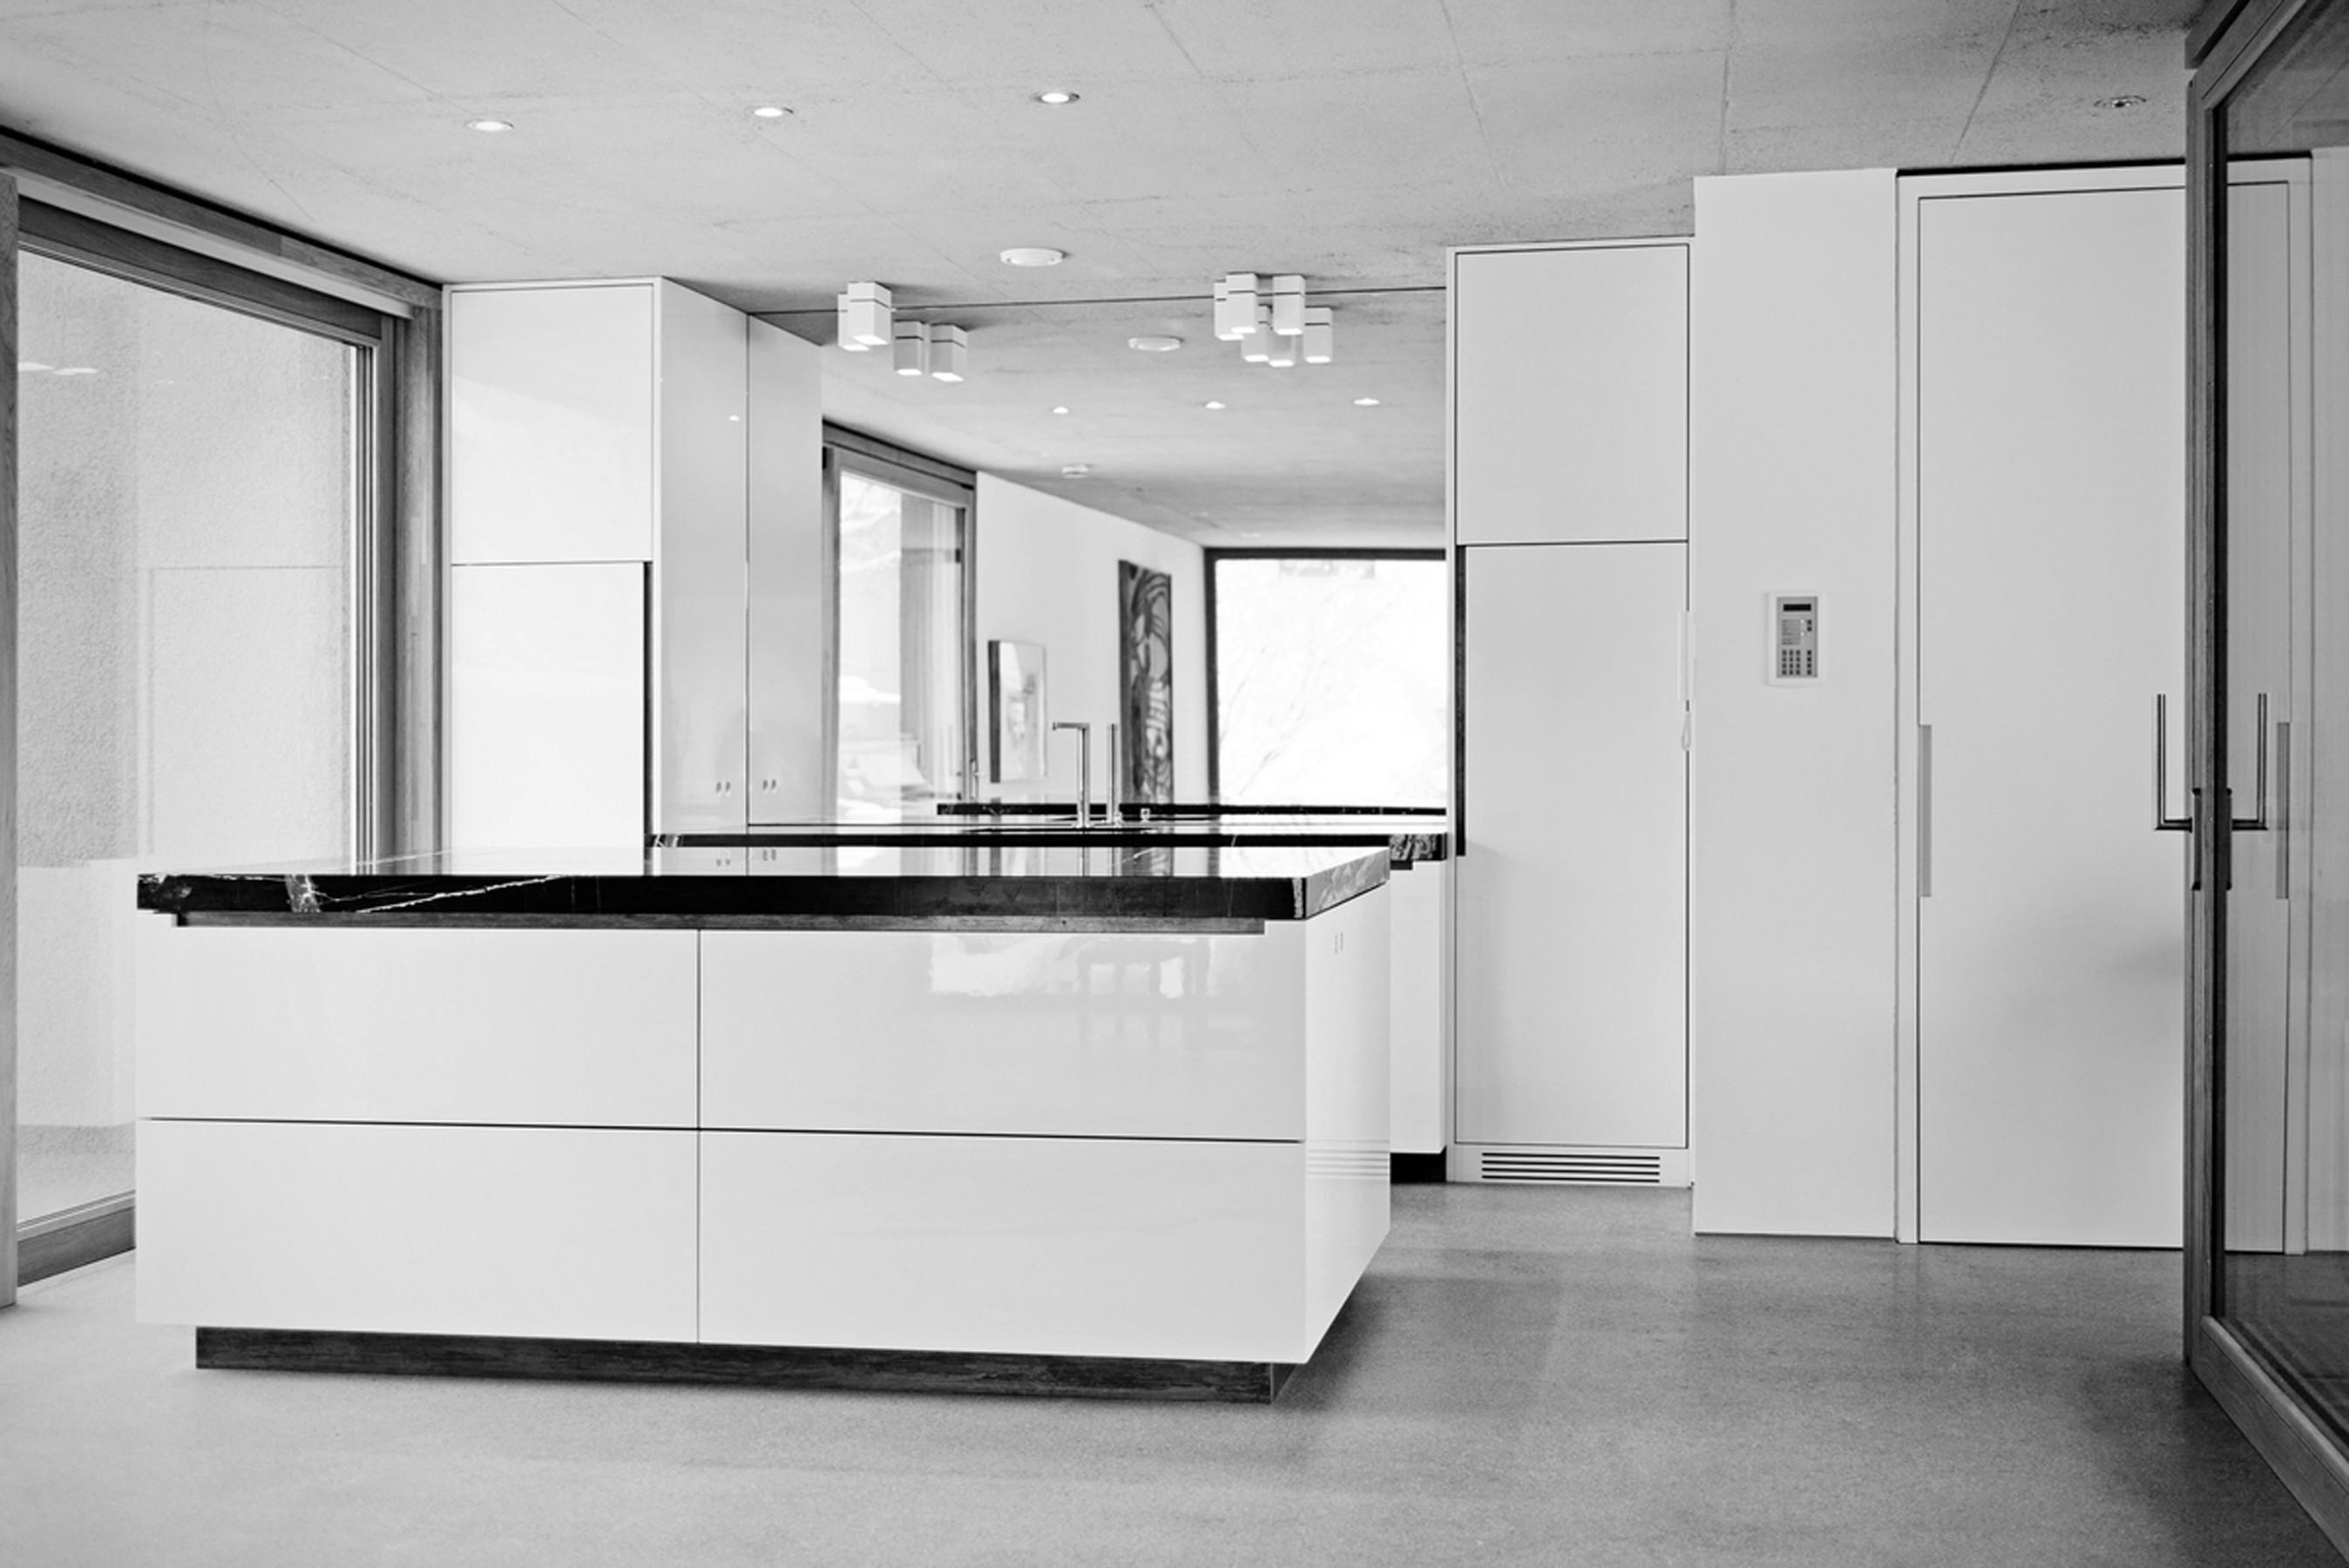 Jürgen Krämer - Manufaktur Innenarchitektur Mobiliar | Kueche